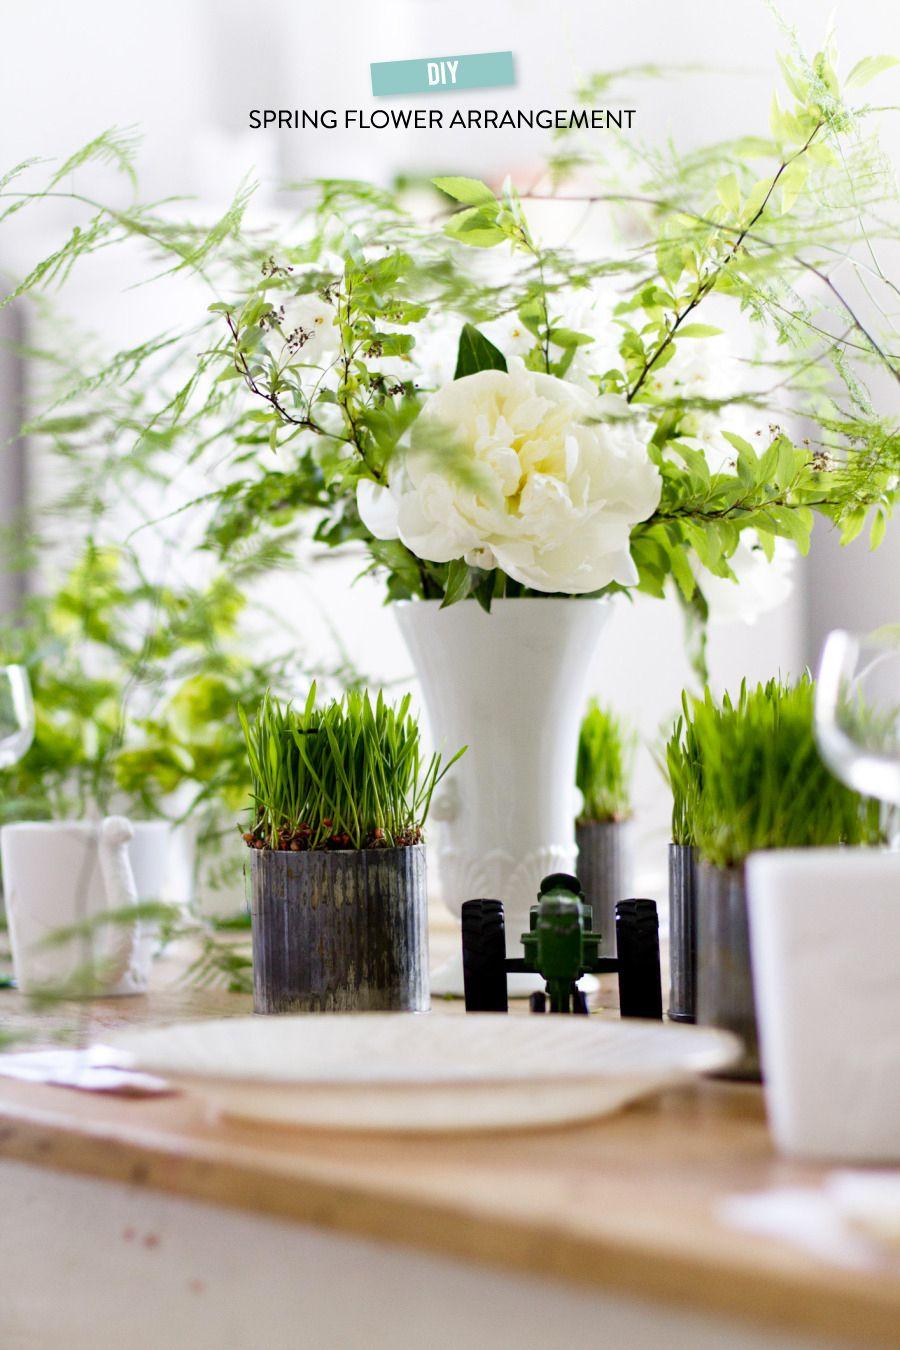 #diy, #centerpiece, #floral-arrangement, #spring  Photography: Rikki Snyder - rikkisnyder.com  Read More: http://www.stylemepretty.com/living/2014/03/27/mint-melon-salad/